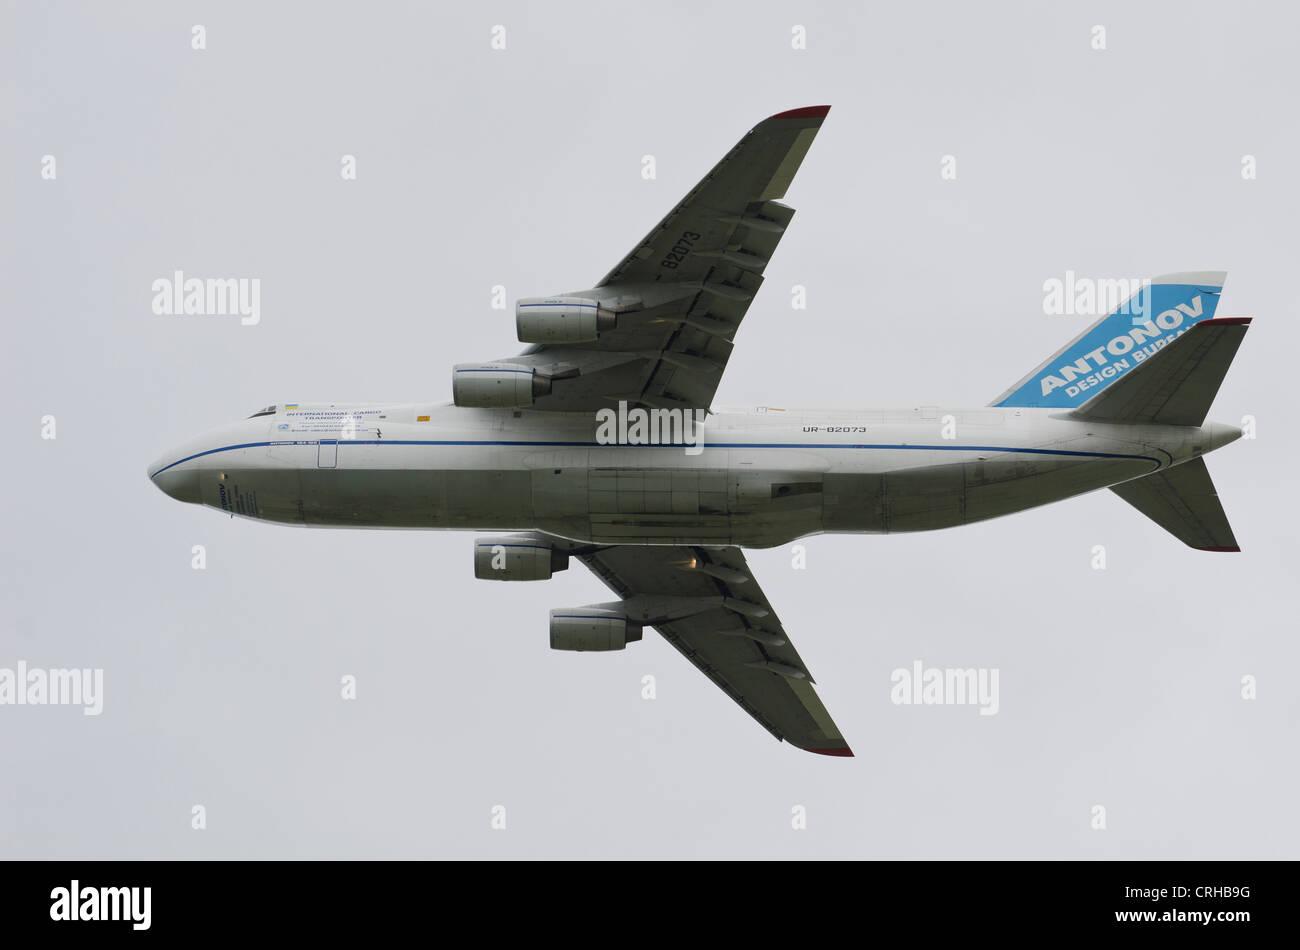 Antonov An-124 - Ruslan International transport aircraft - Stock Image